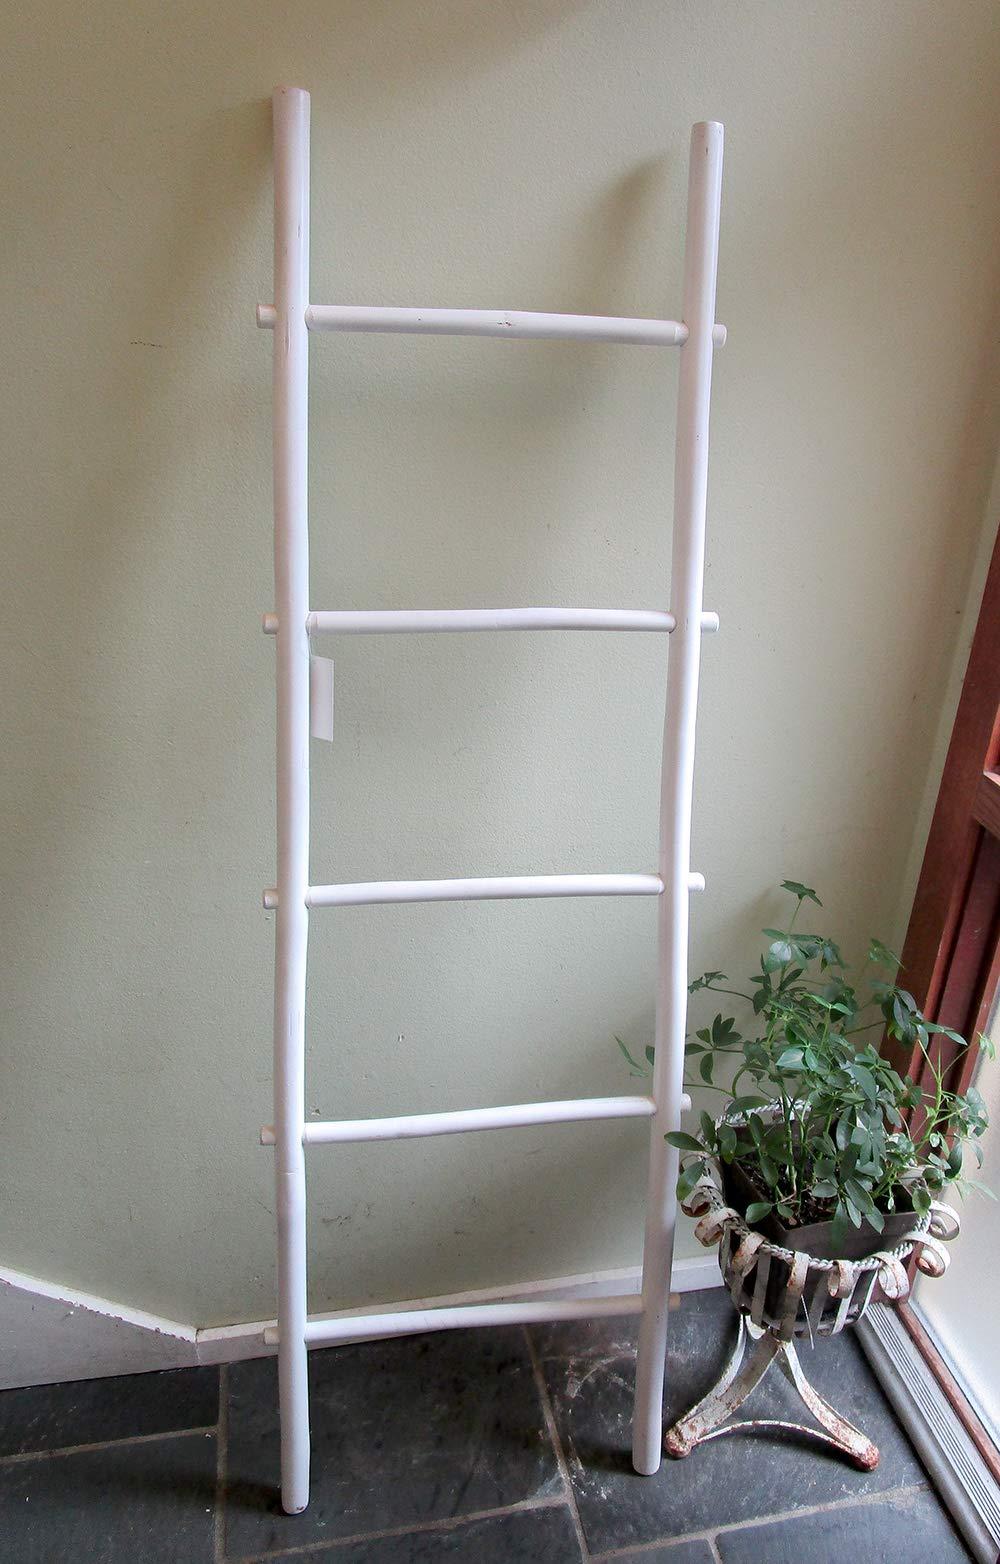 Master Garden Products 6 de bambú Escalera Estante, Blanco Mancha Acabado: Amazon.es: Hogar